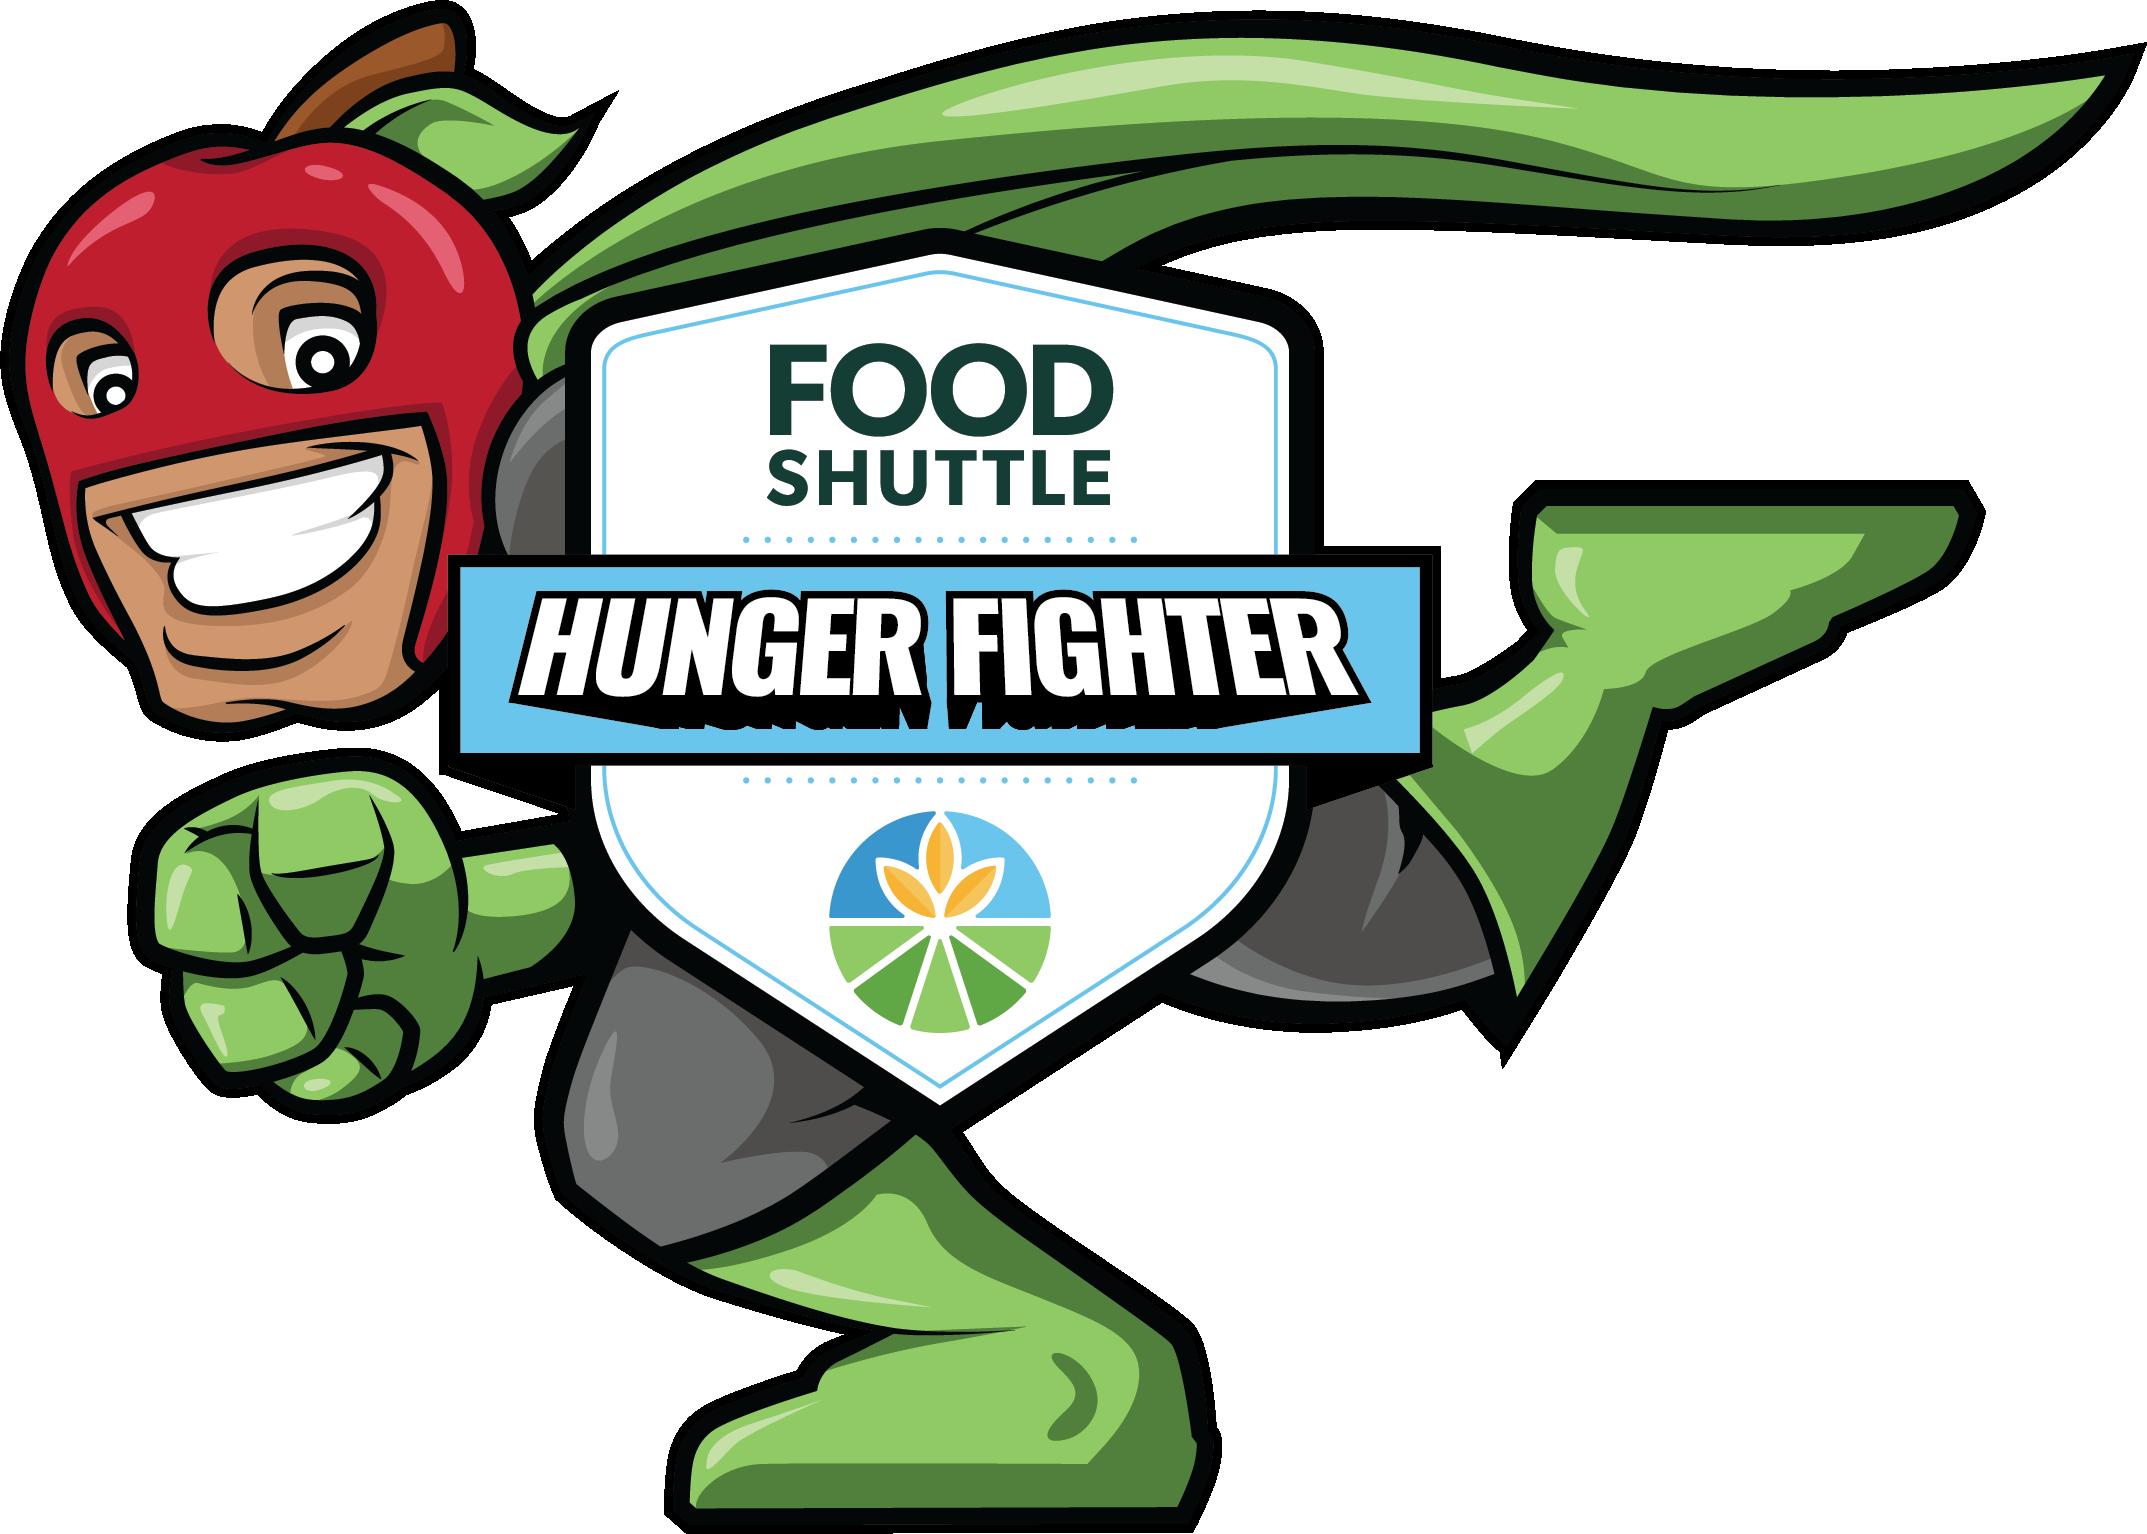 hunger-fighter-color.png